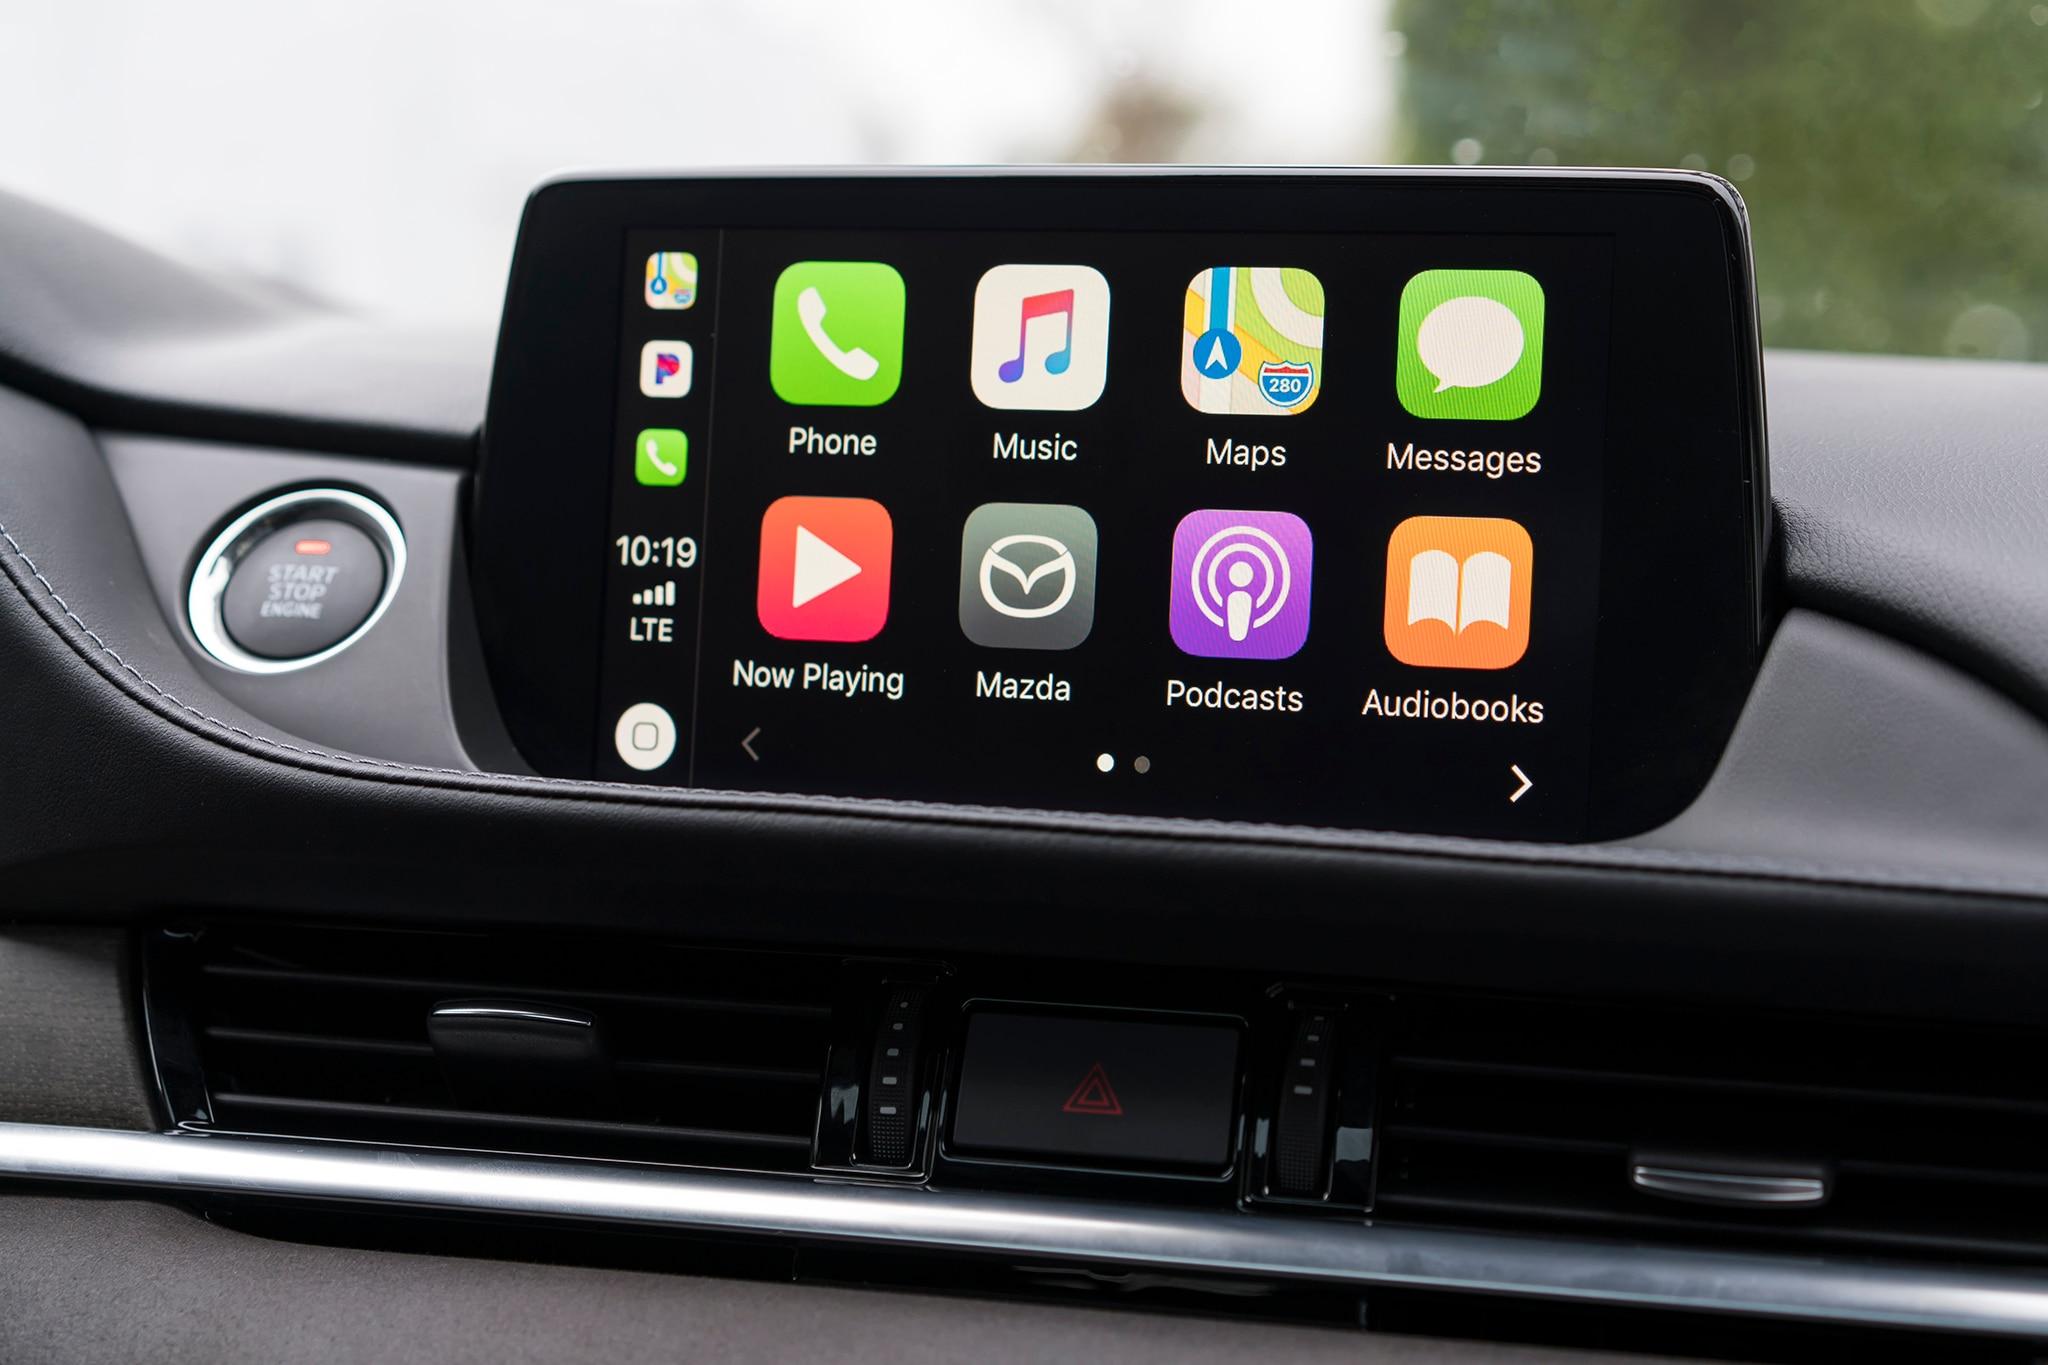 Mazda CarPlay